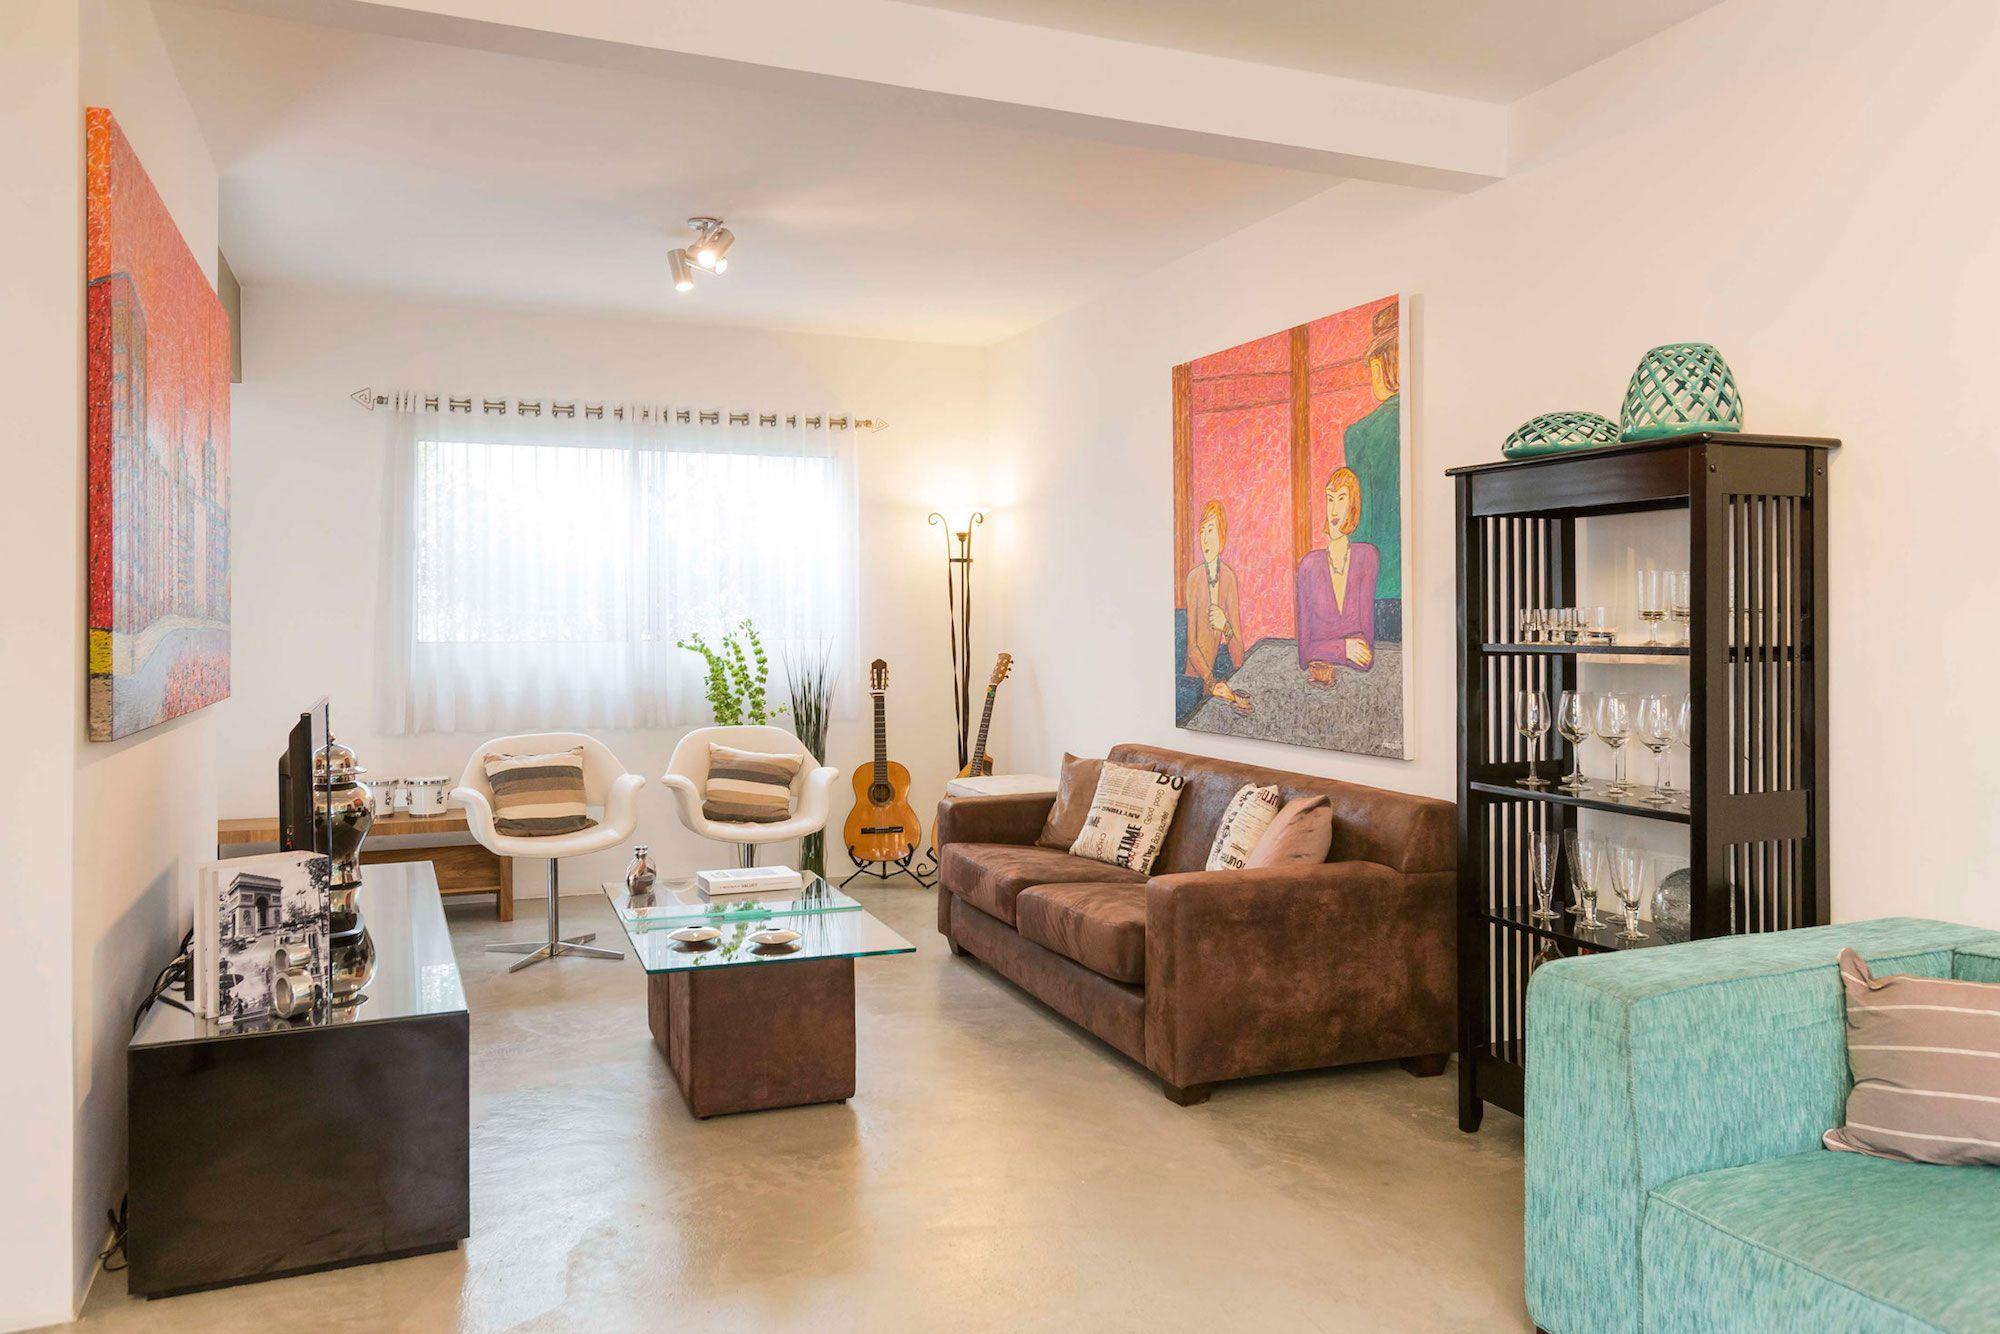 Granja-Julieta-Residence-10